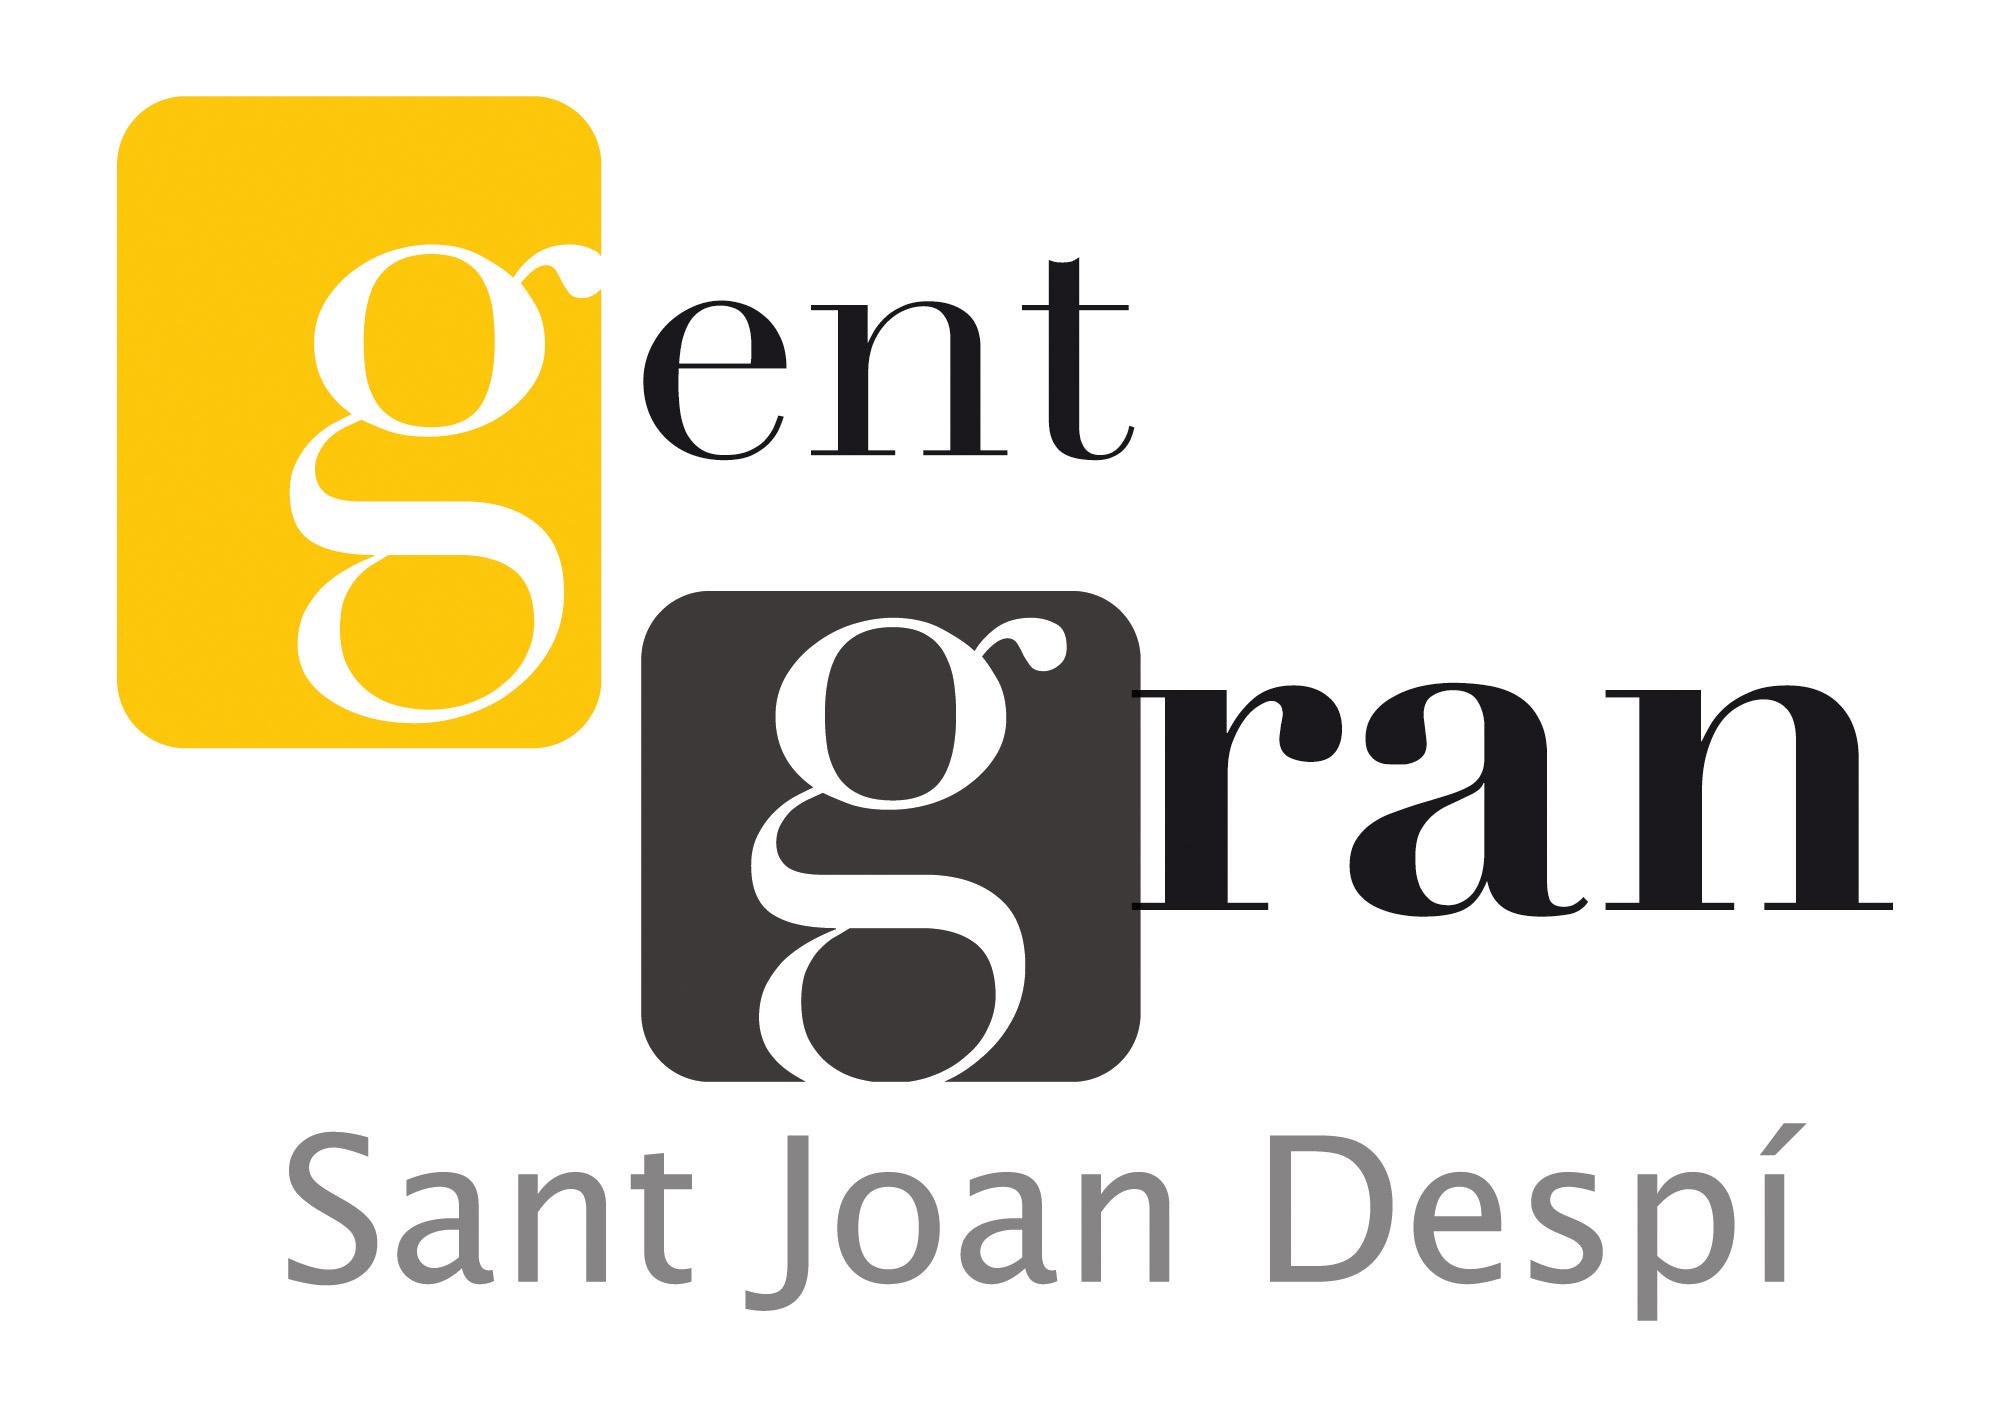 LOGO GENT GRAN